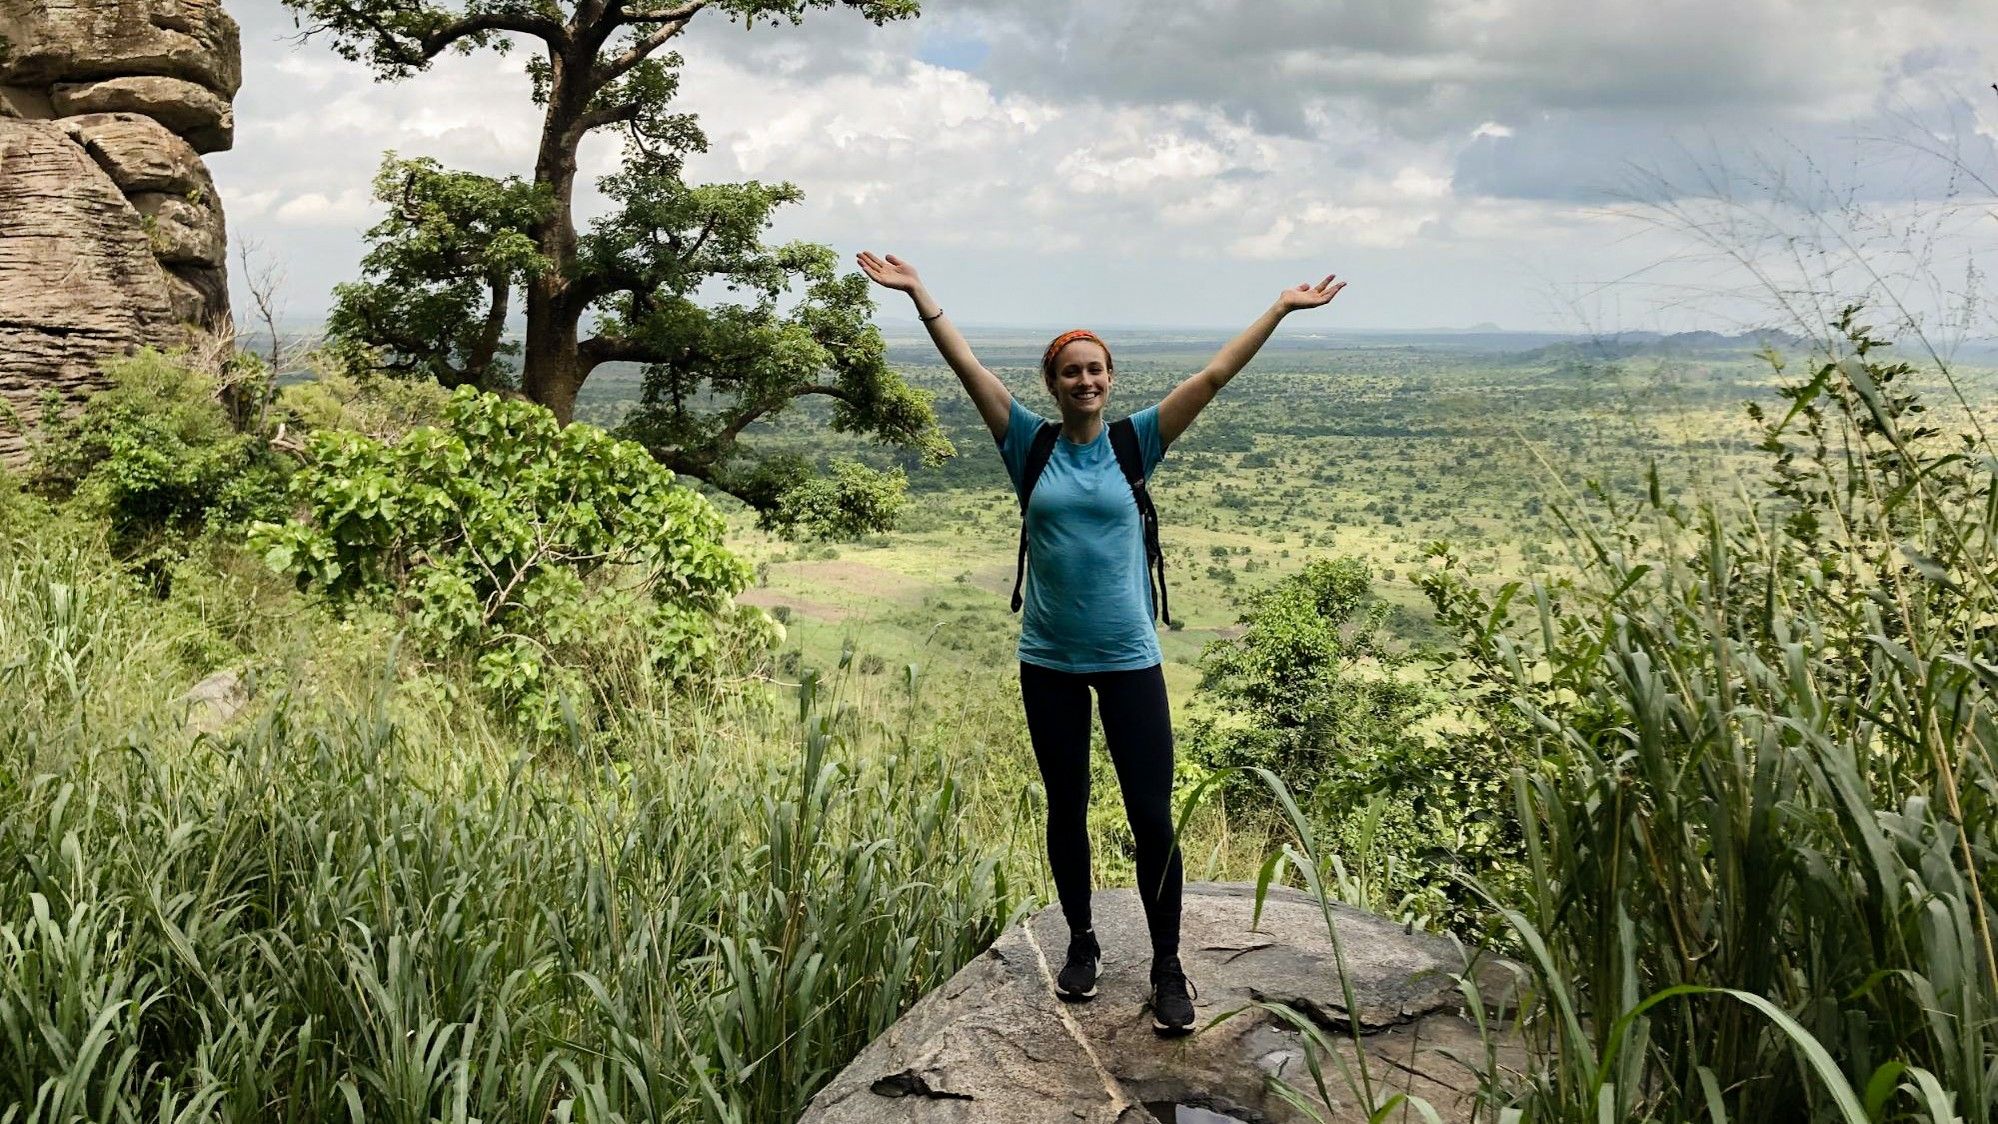 ESP internship stories: Laura in Accra Ghana